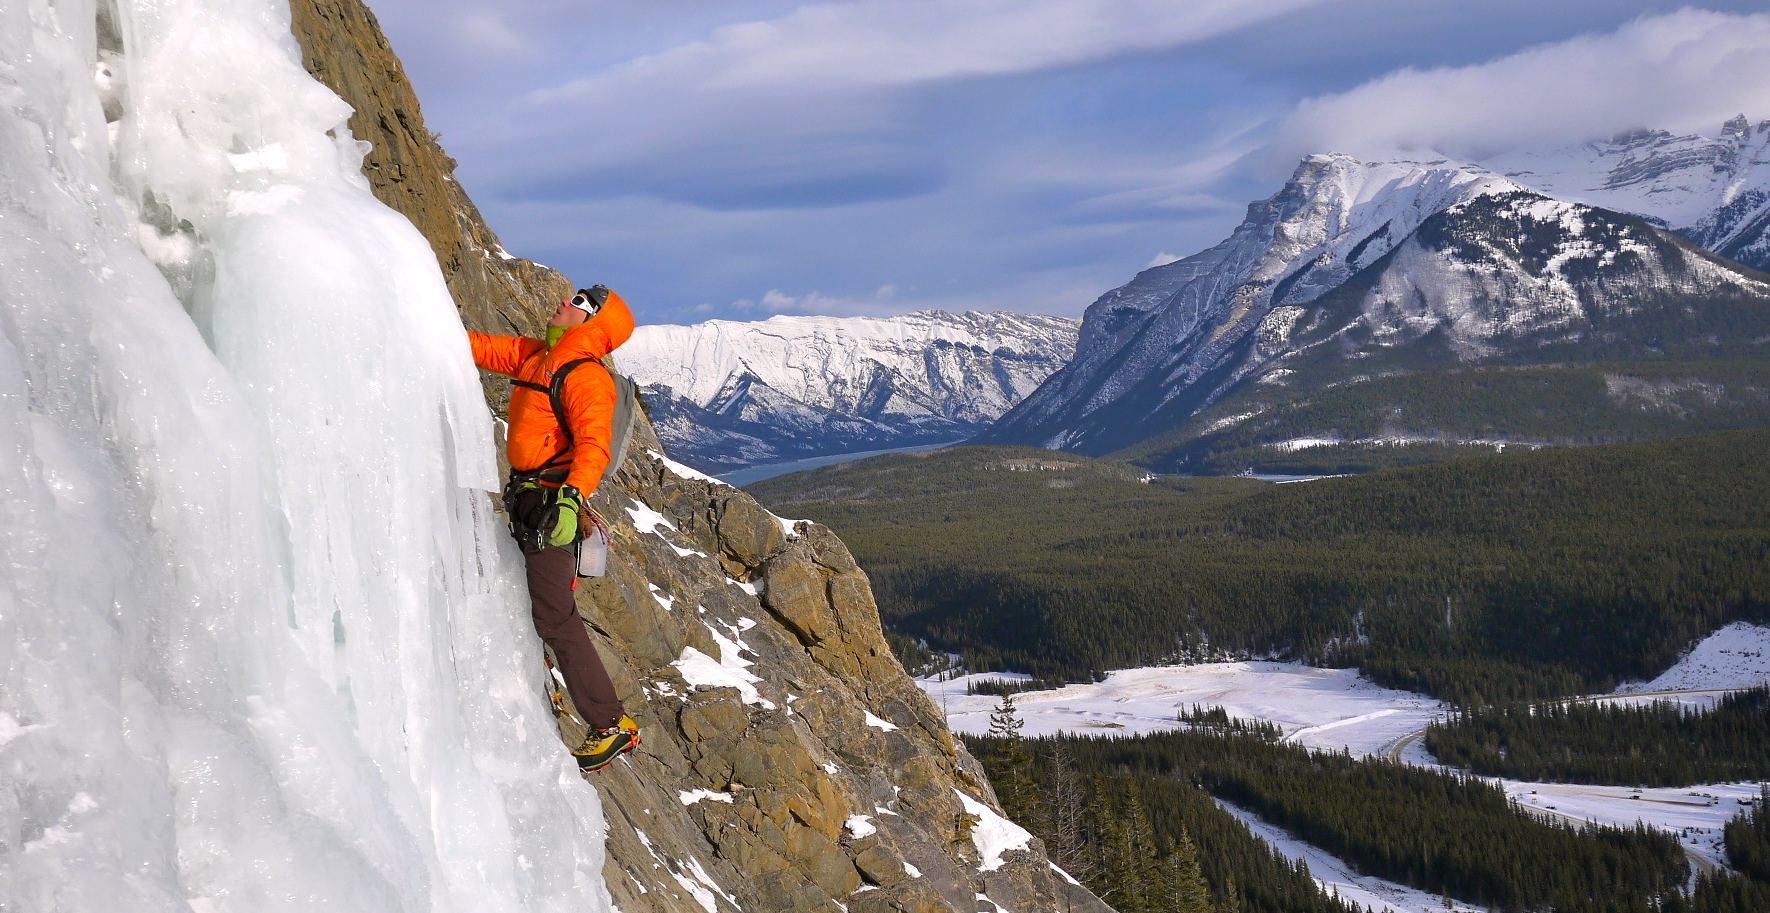 Climber on Cascade Falls